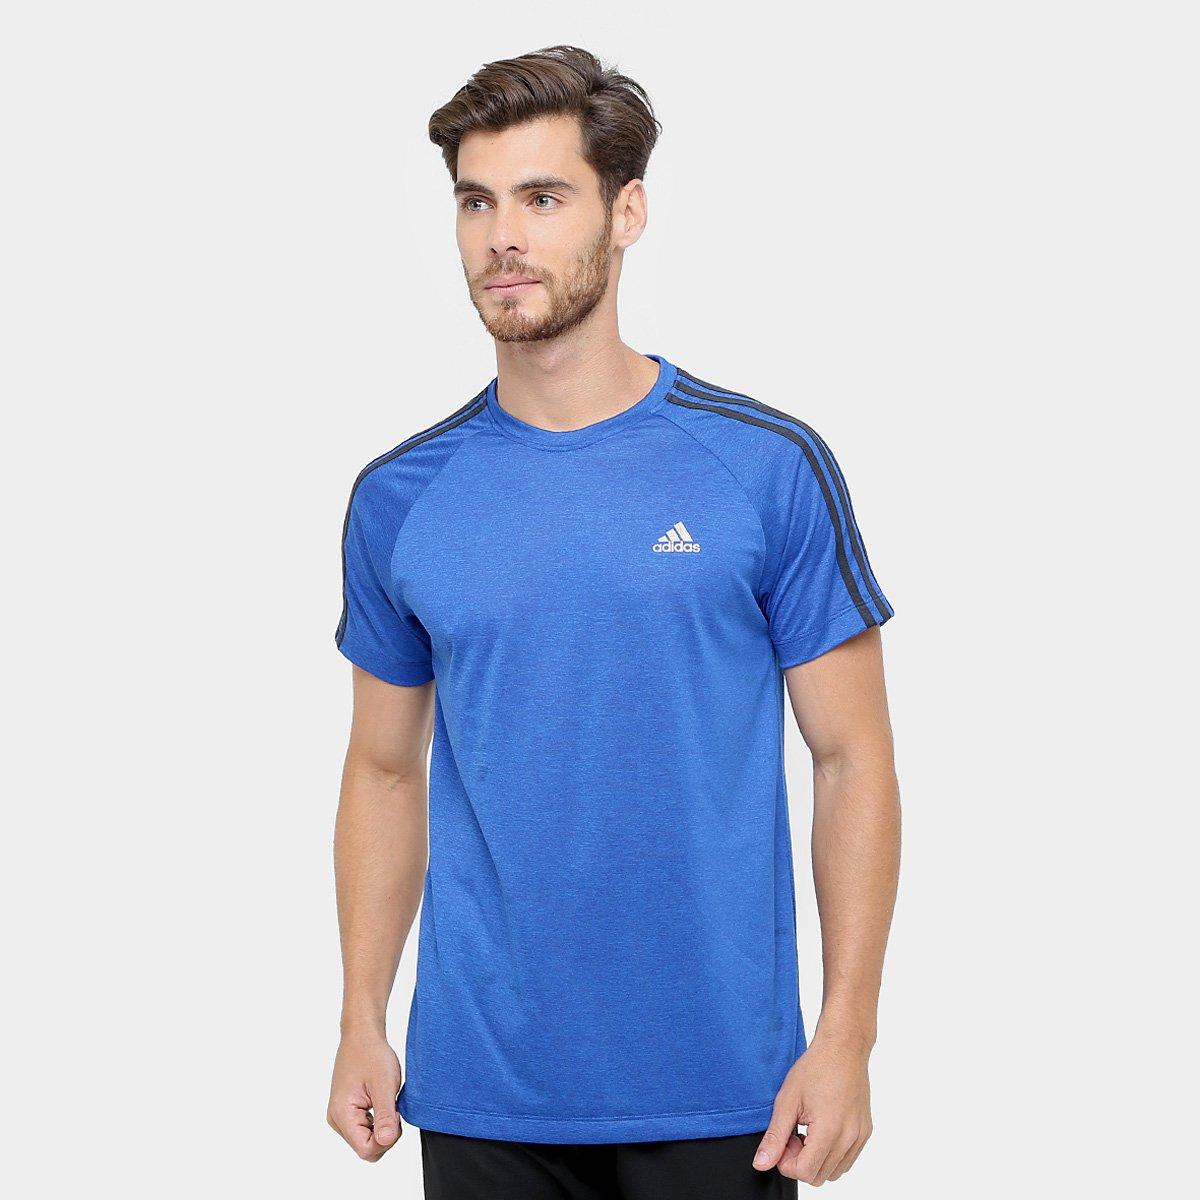 655ac8b98b Camiseta Adidas 3S Essential Masculina